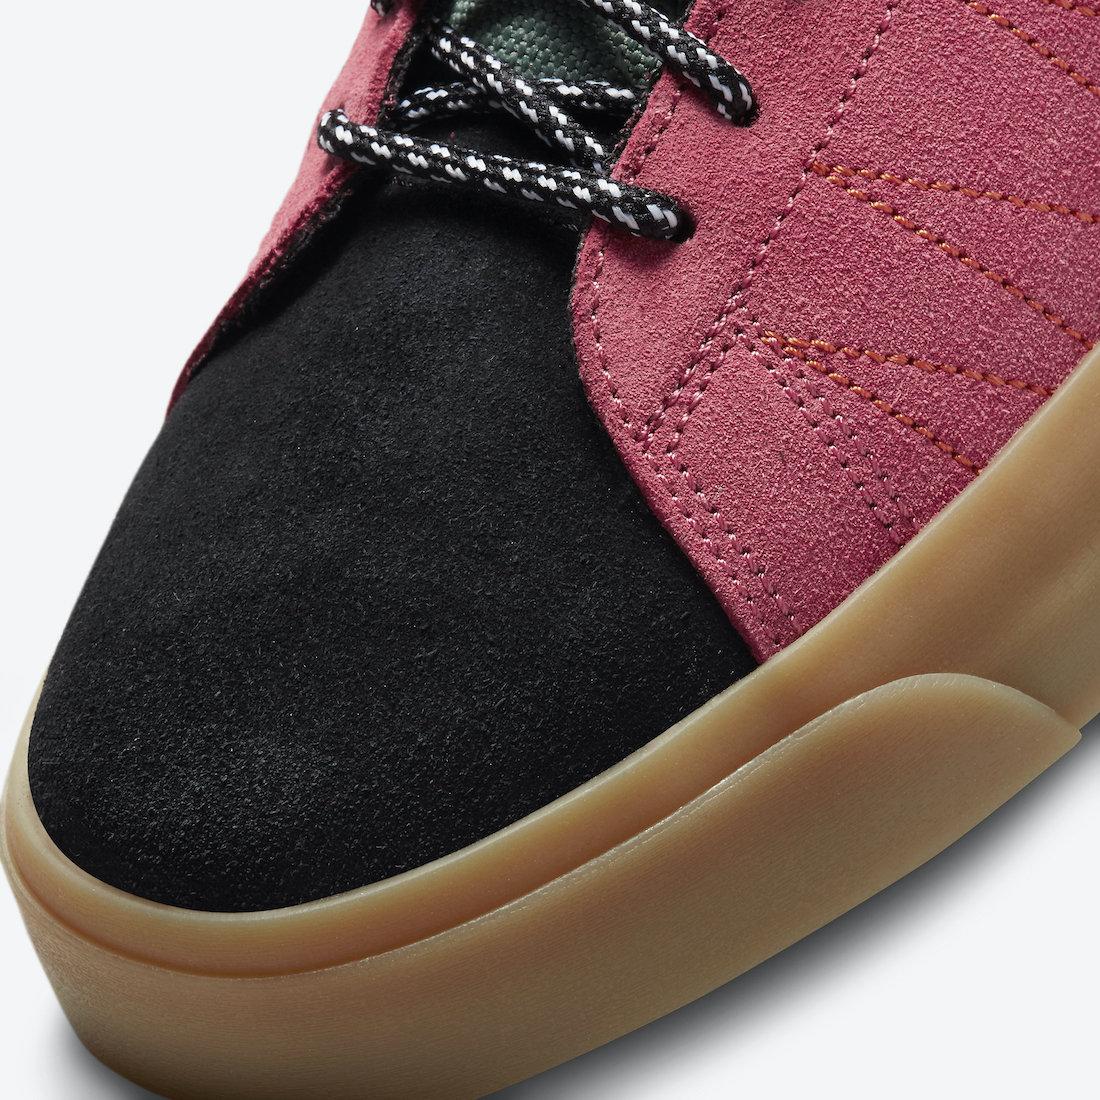 Nike SB Blazer Mid Premium Acclimate Sport Spice DC8903-301 Release Date Info